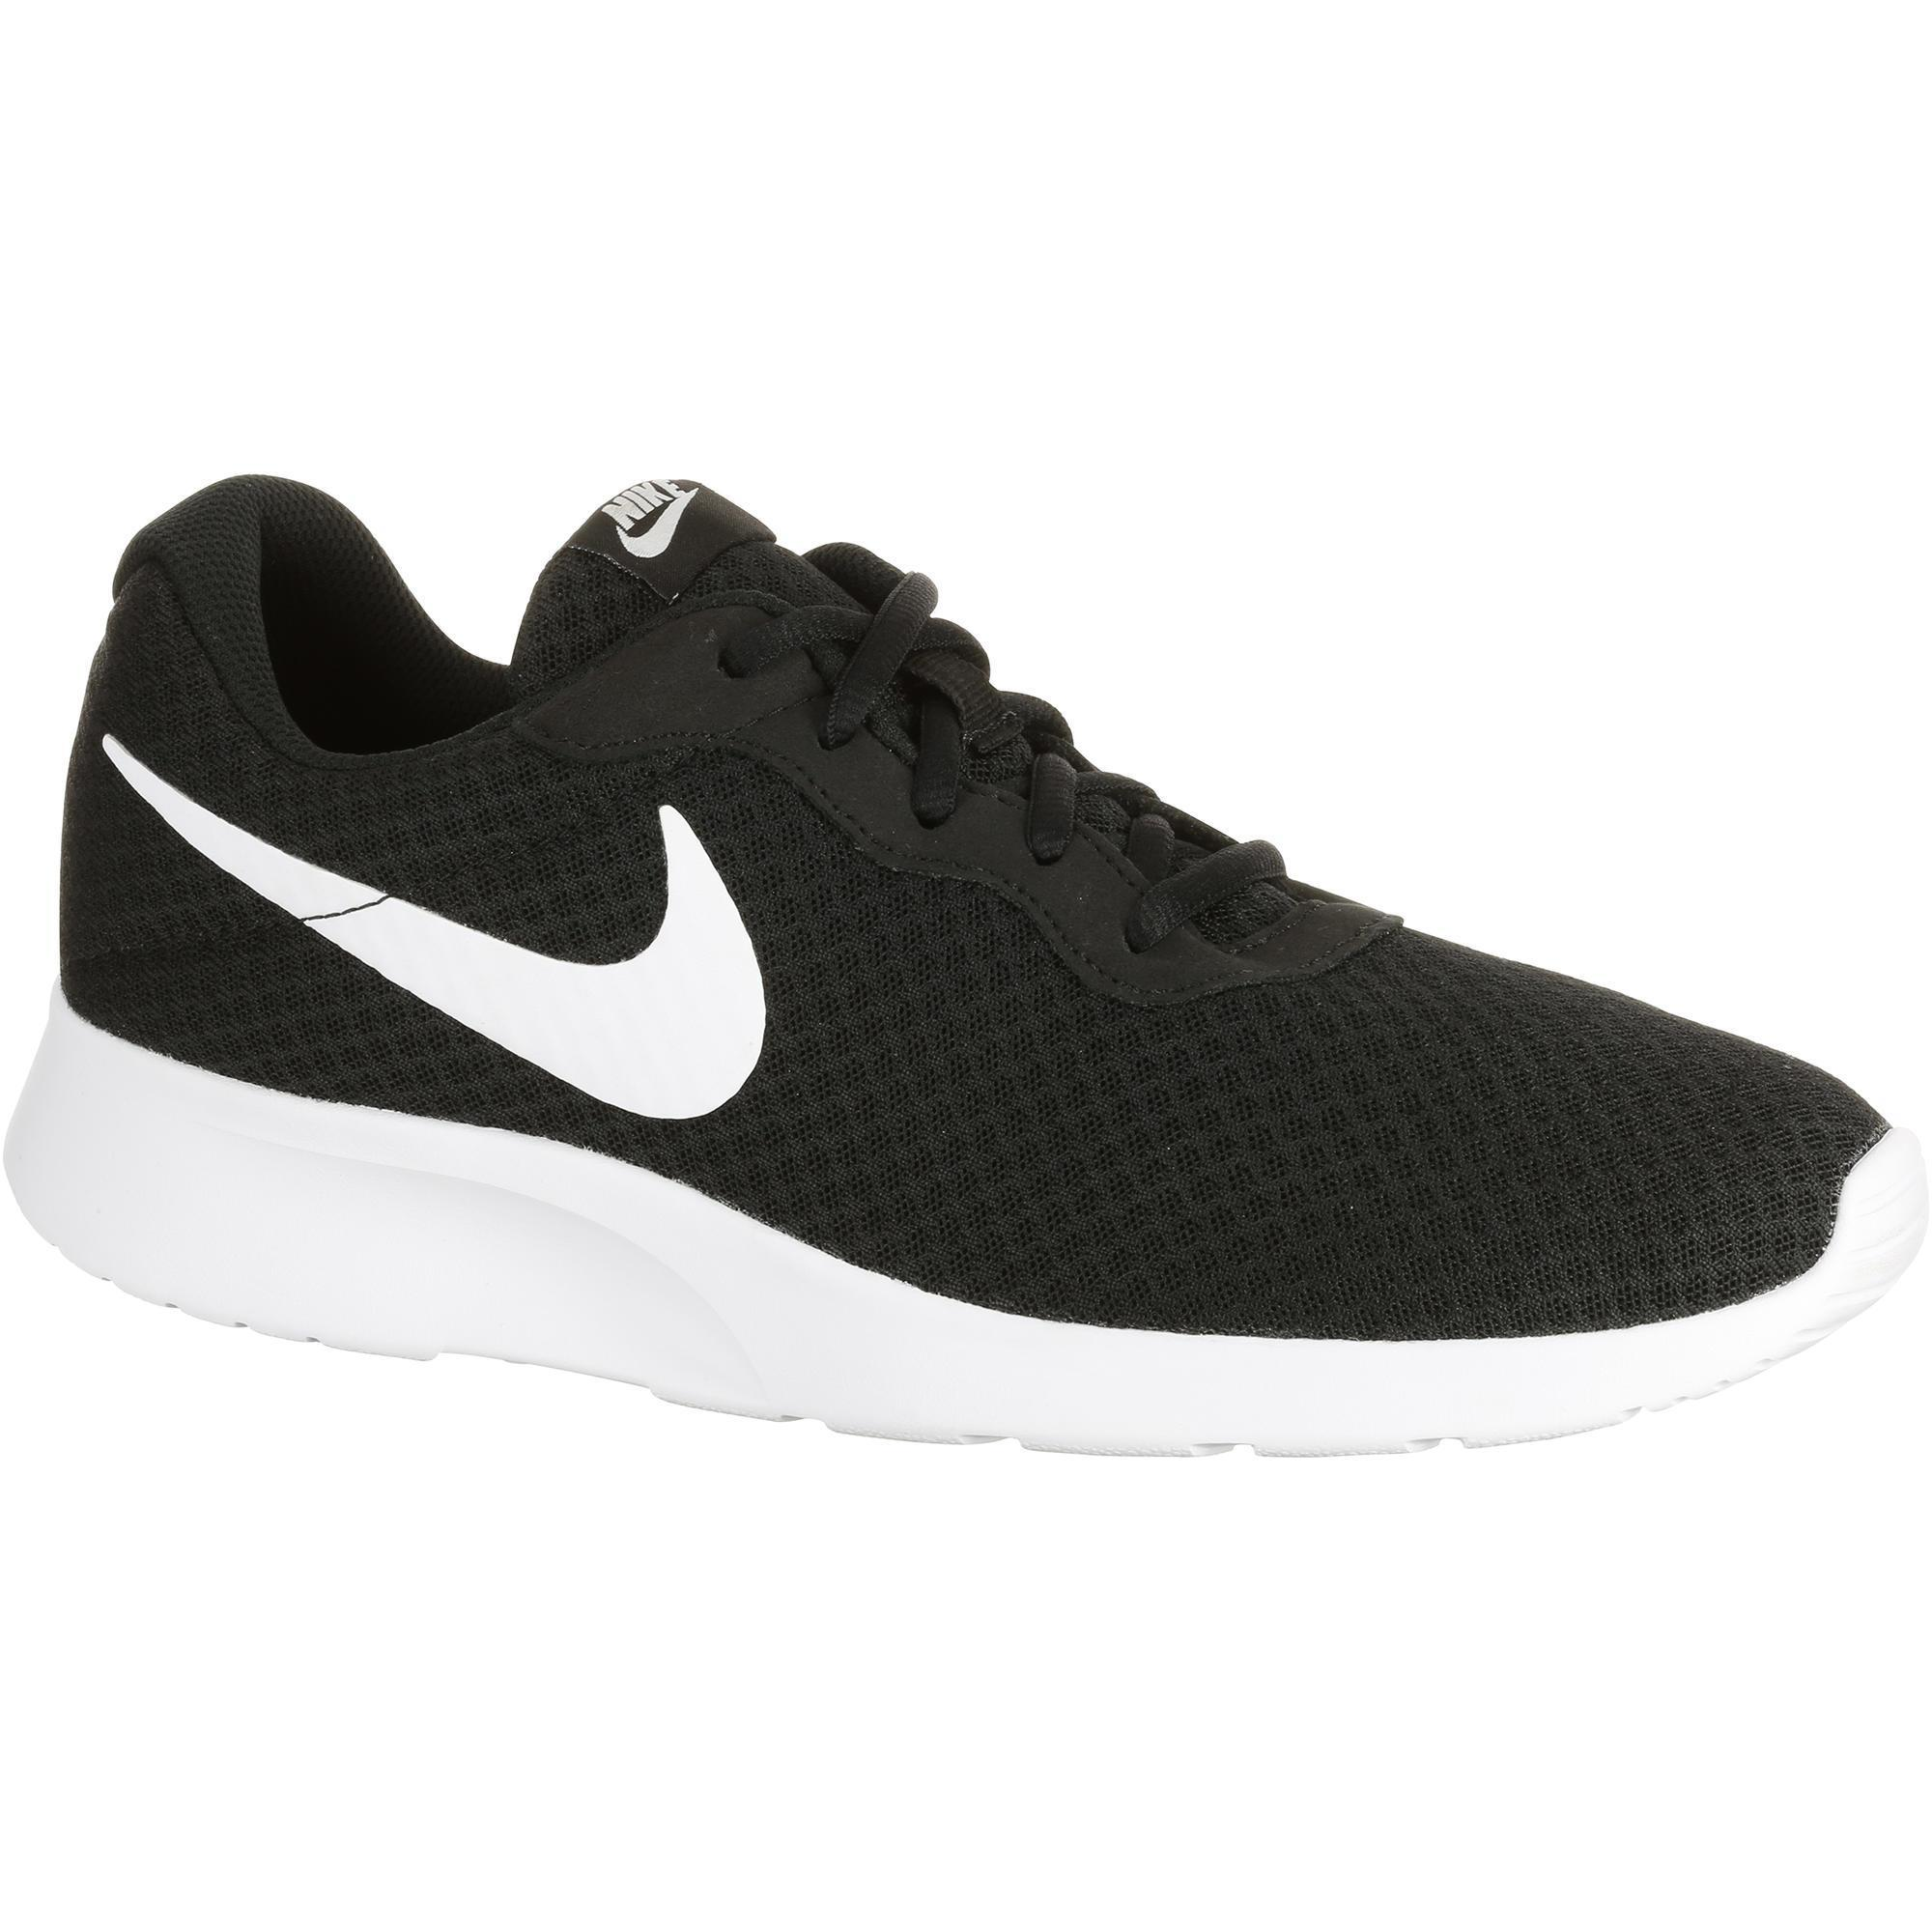 brand new fe1de aa6ca Zapatillas de marcha deportiva para hombre Tanjun negro   blanco Nike    Decathlon